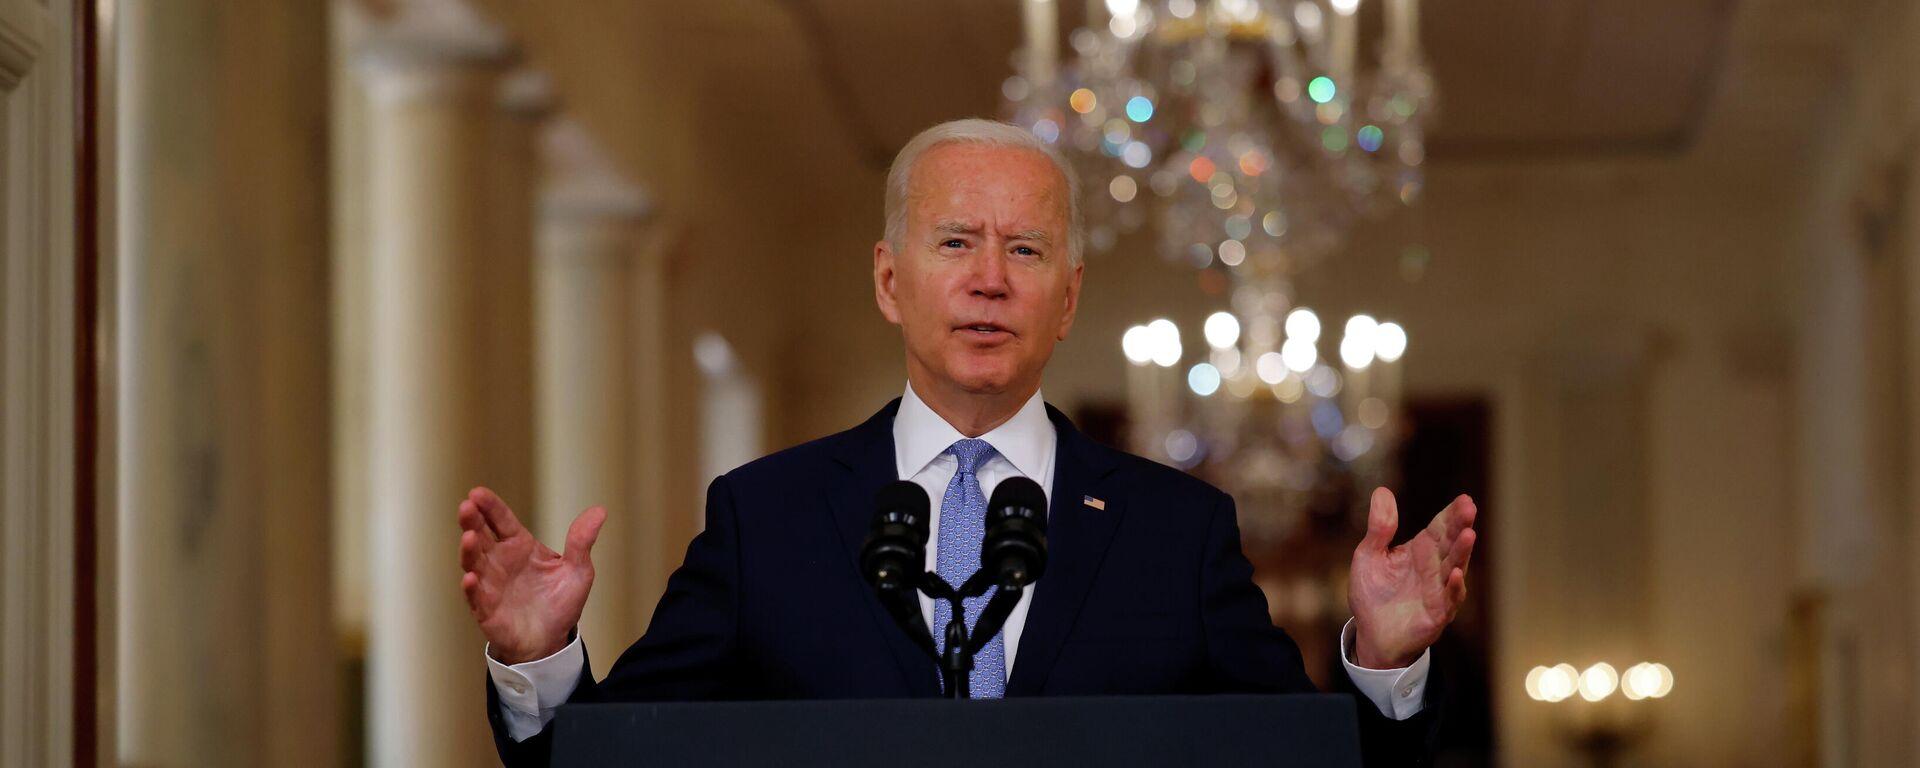 Joe Biden, presidente de EEUU - Sputnik Mundo, 1920, 31.08.2021